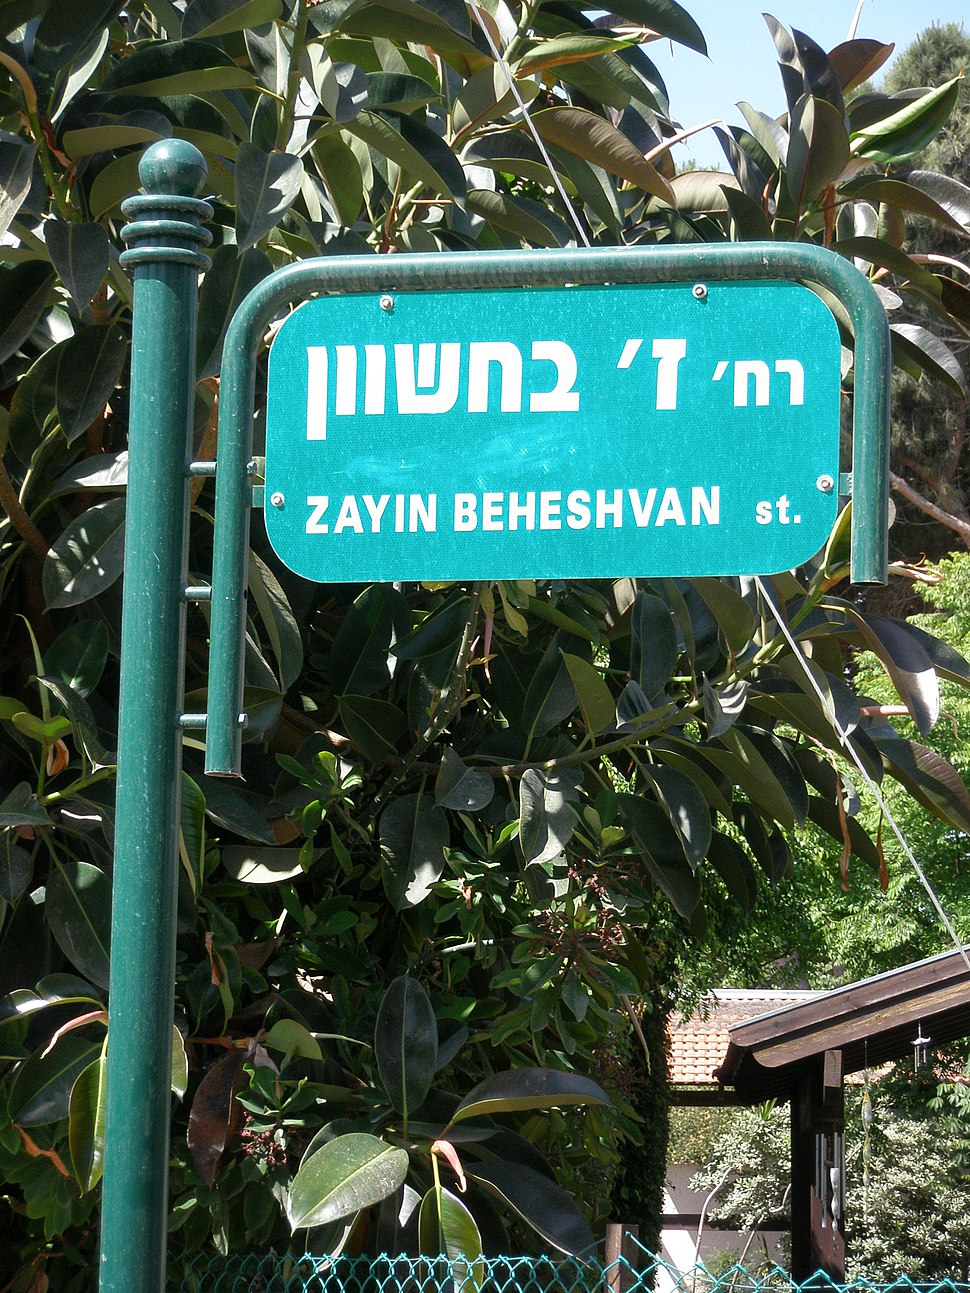 Zayin Beheshvan